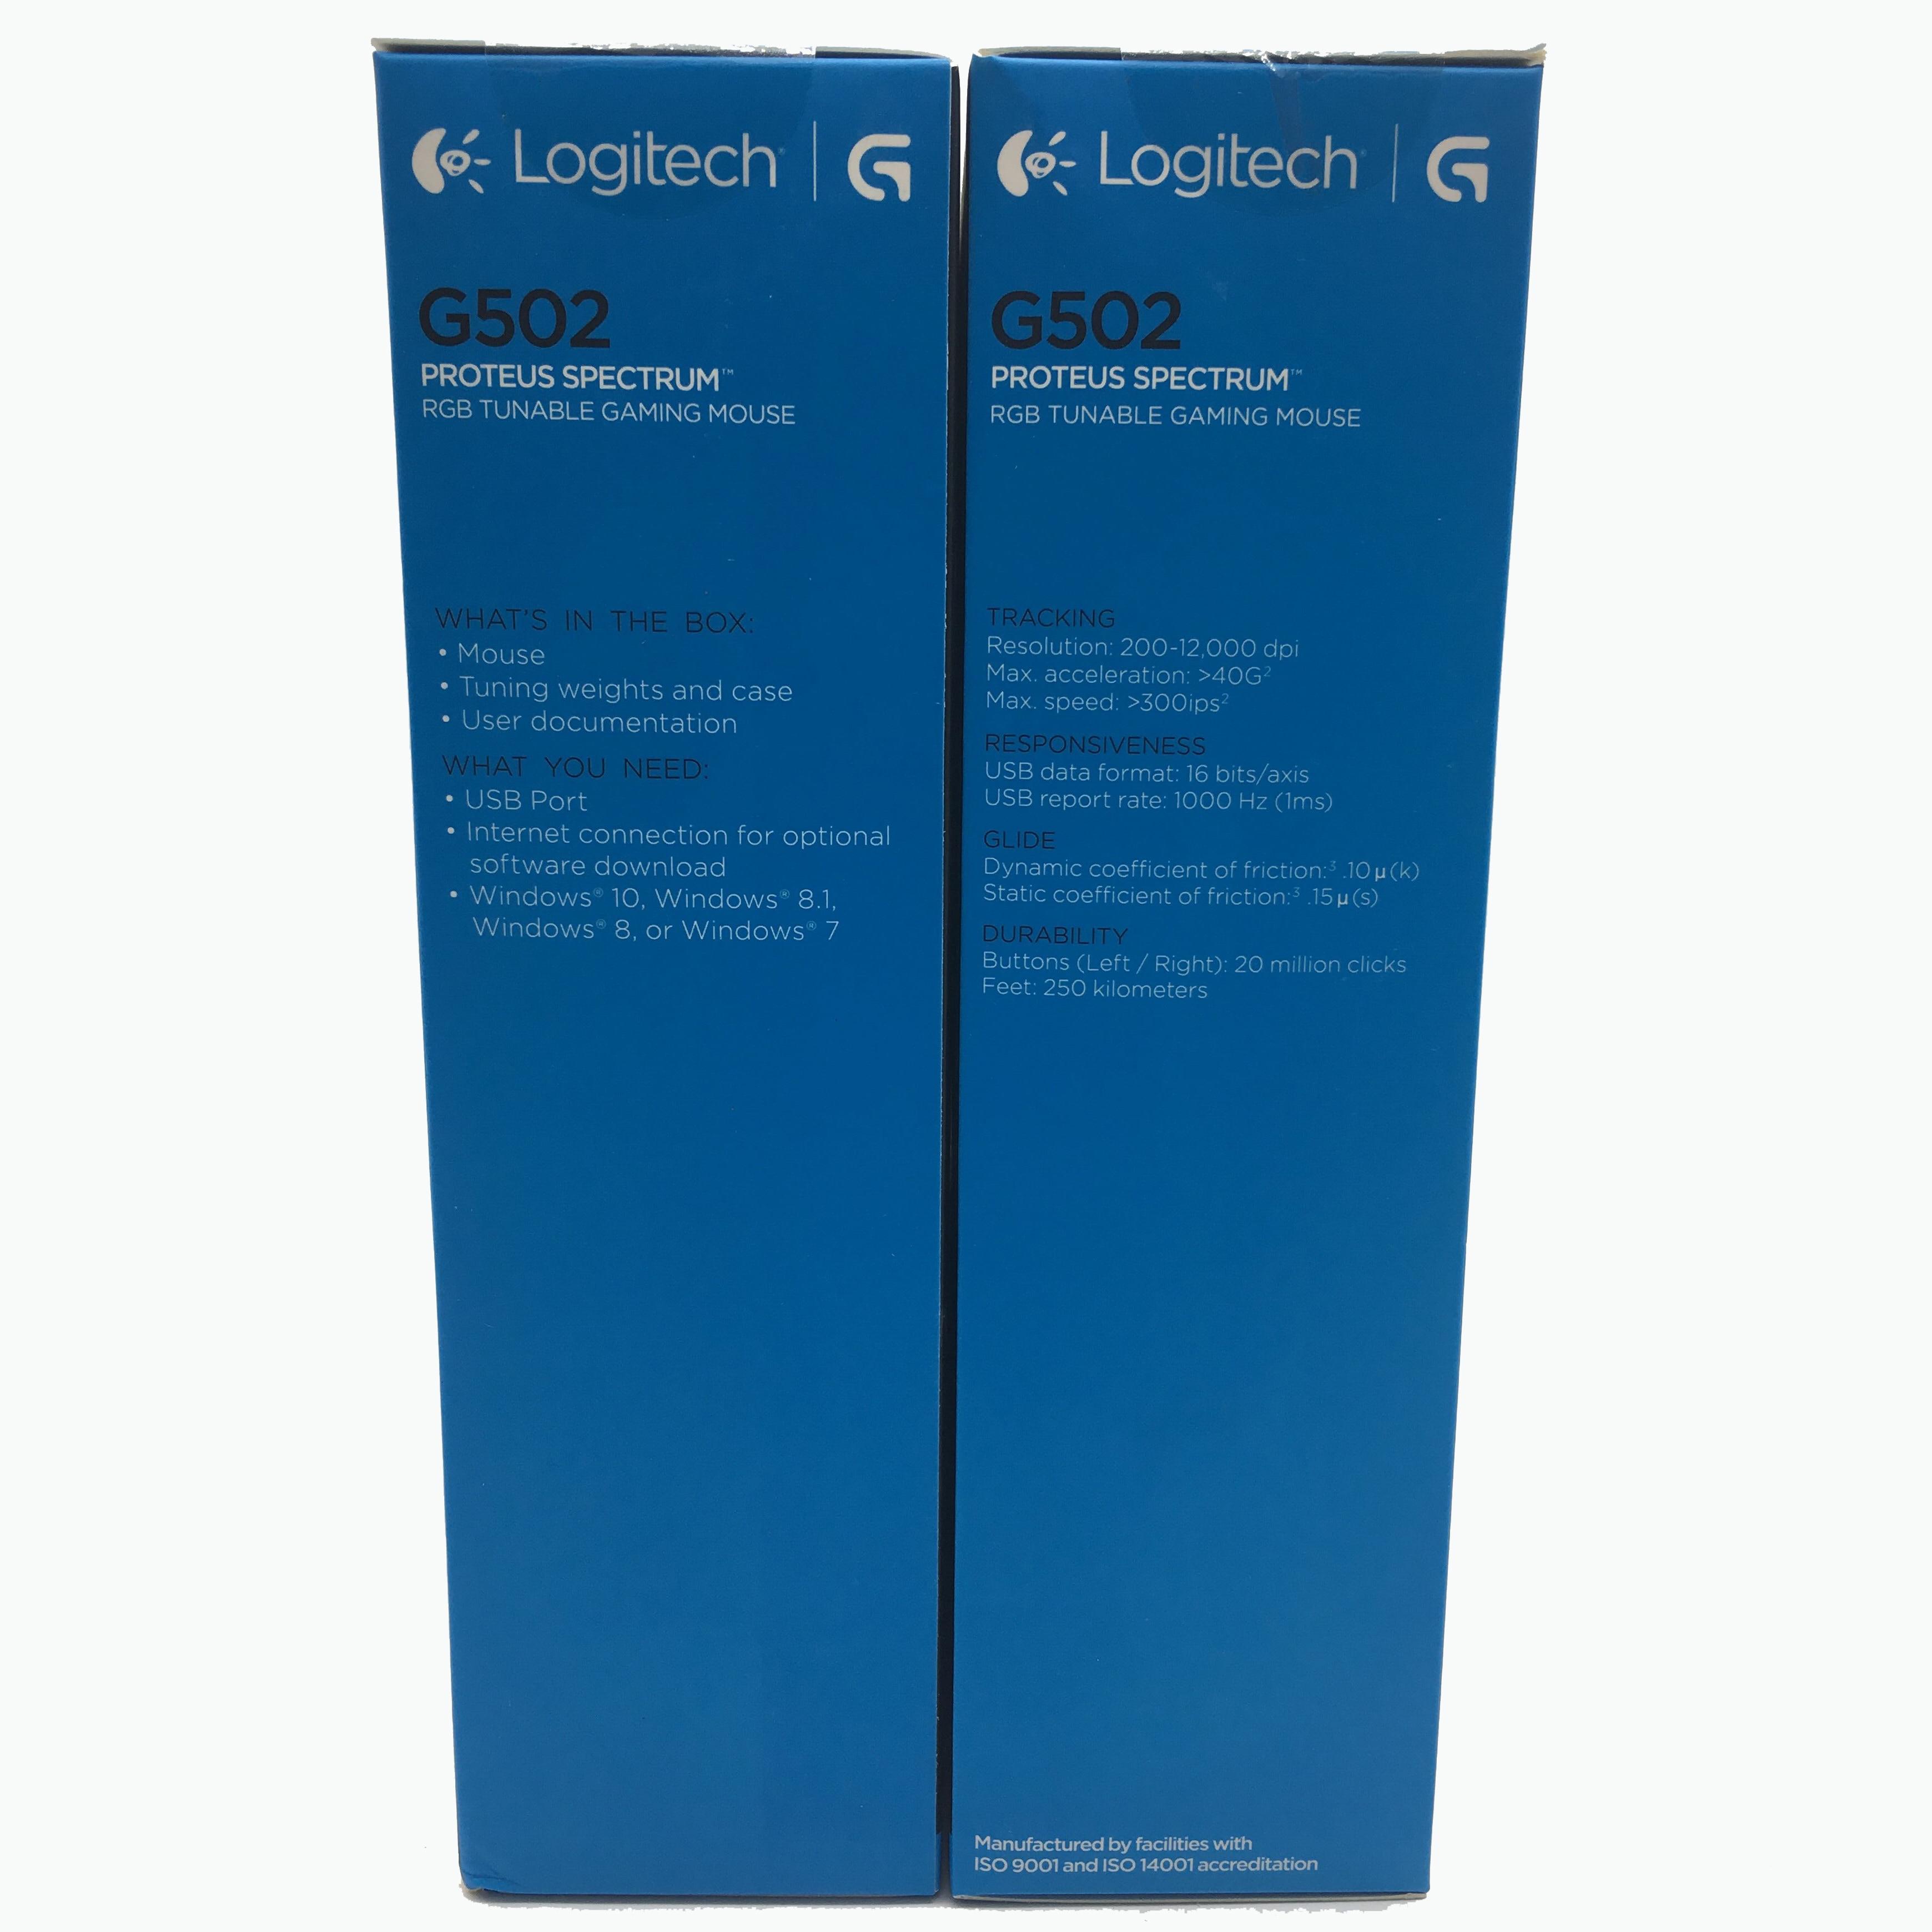 100% genuino Inglese imballaggio Logitech G502 RGB LED Proteus Spettro Laser Sintonizzabile Gaming mouse USB Wired 12000DPI Gamer mouse - 4